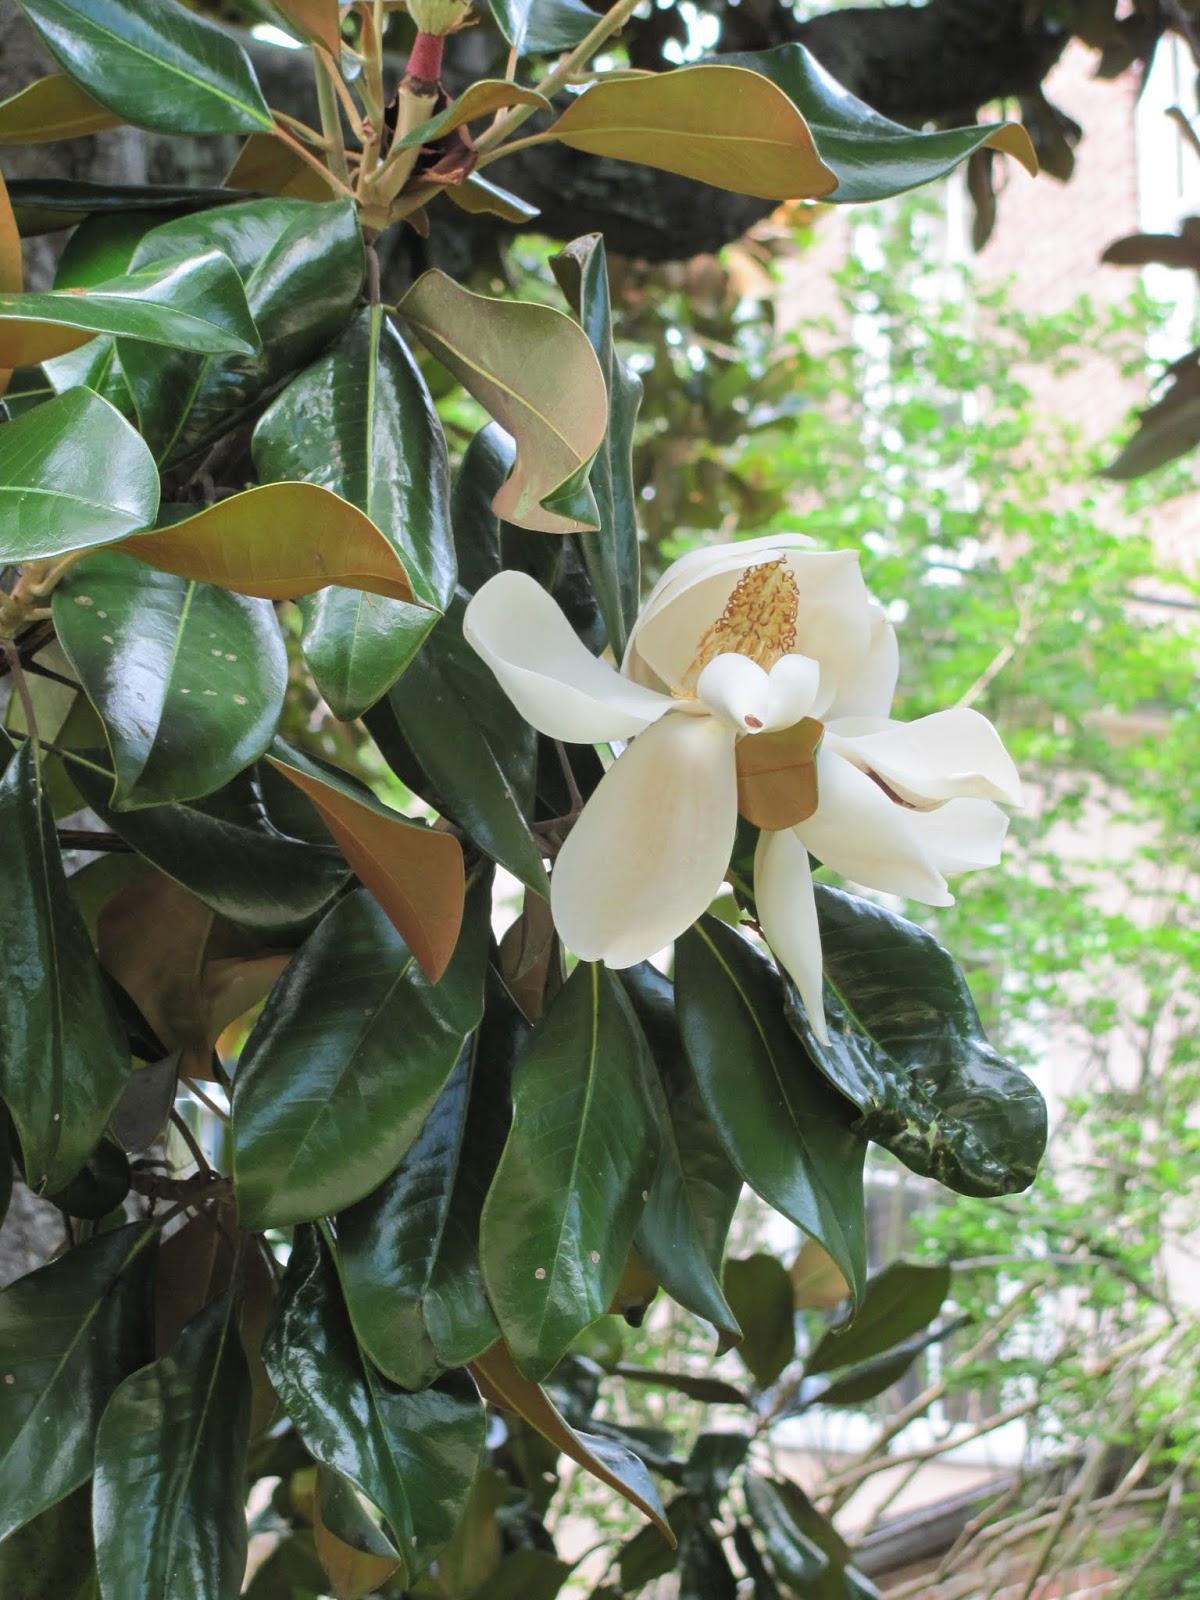 Magnolias bloom in Charleston, SC